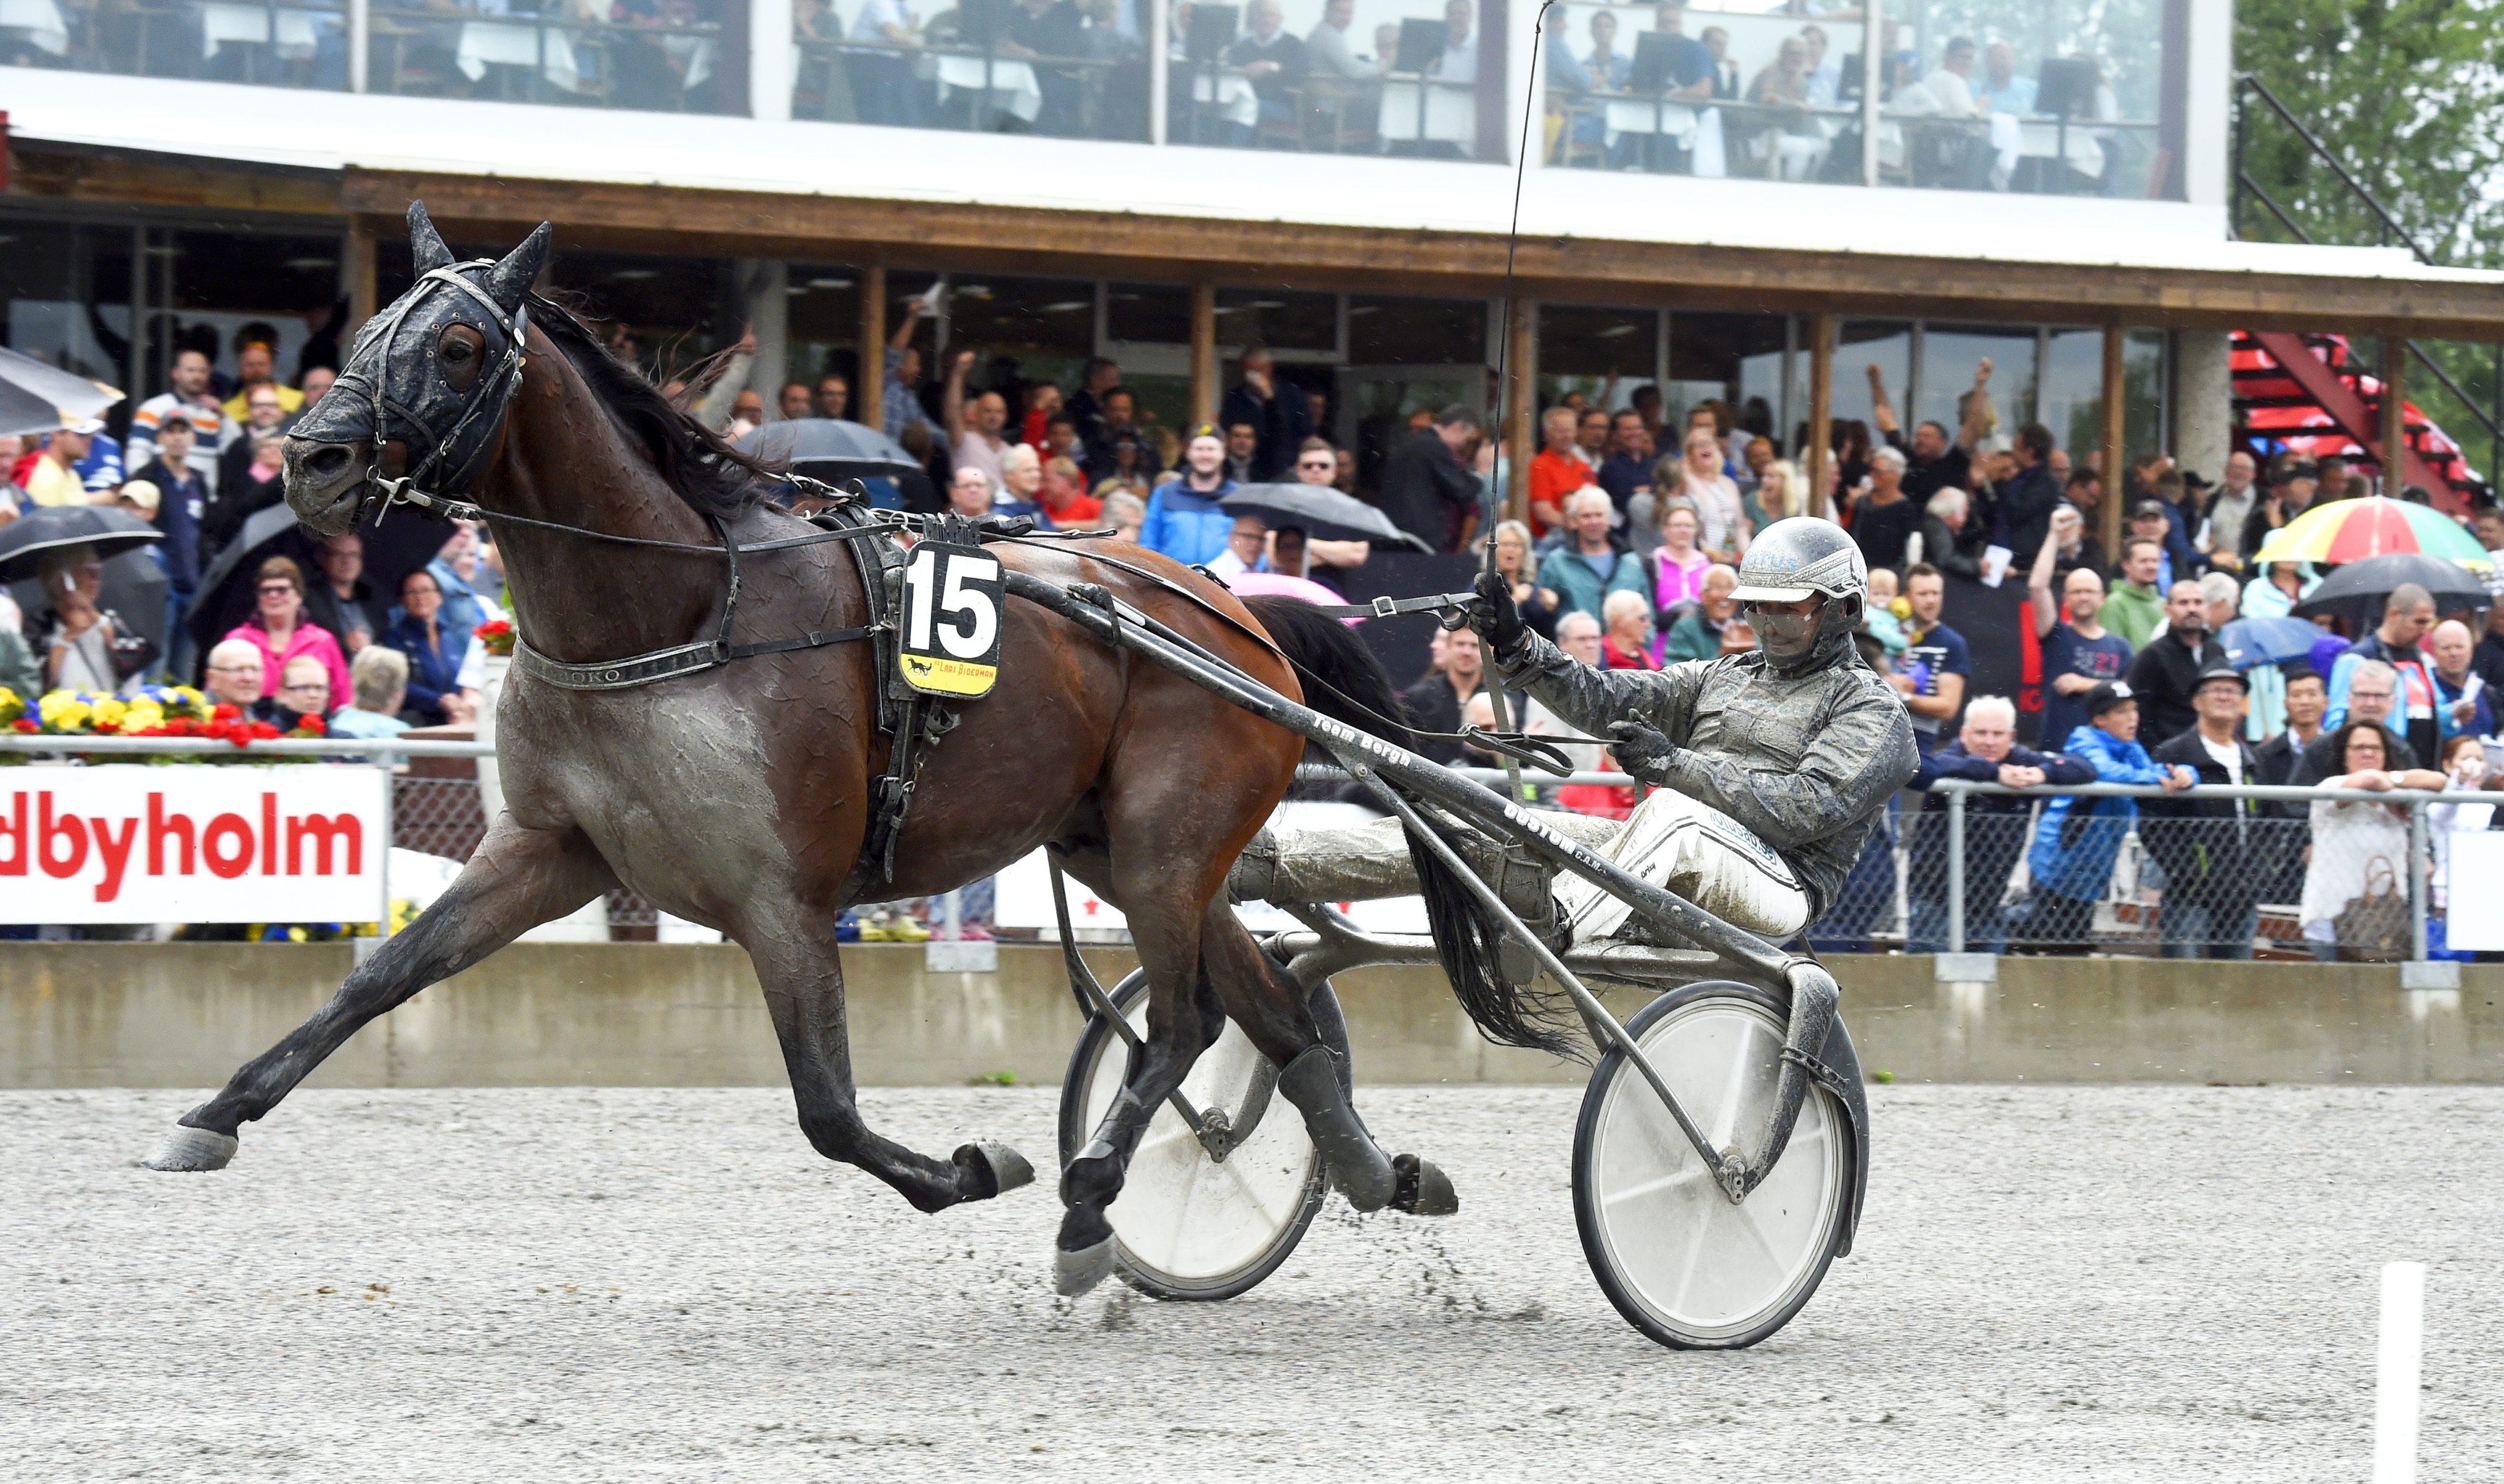 Foto: Martin Langels/ALN Sundbyholm 20160702